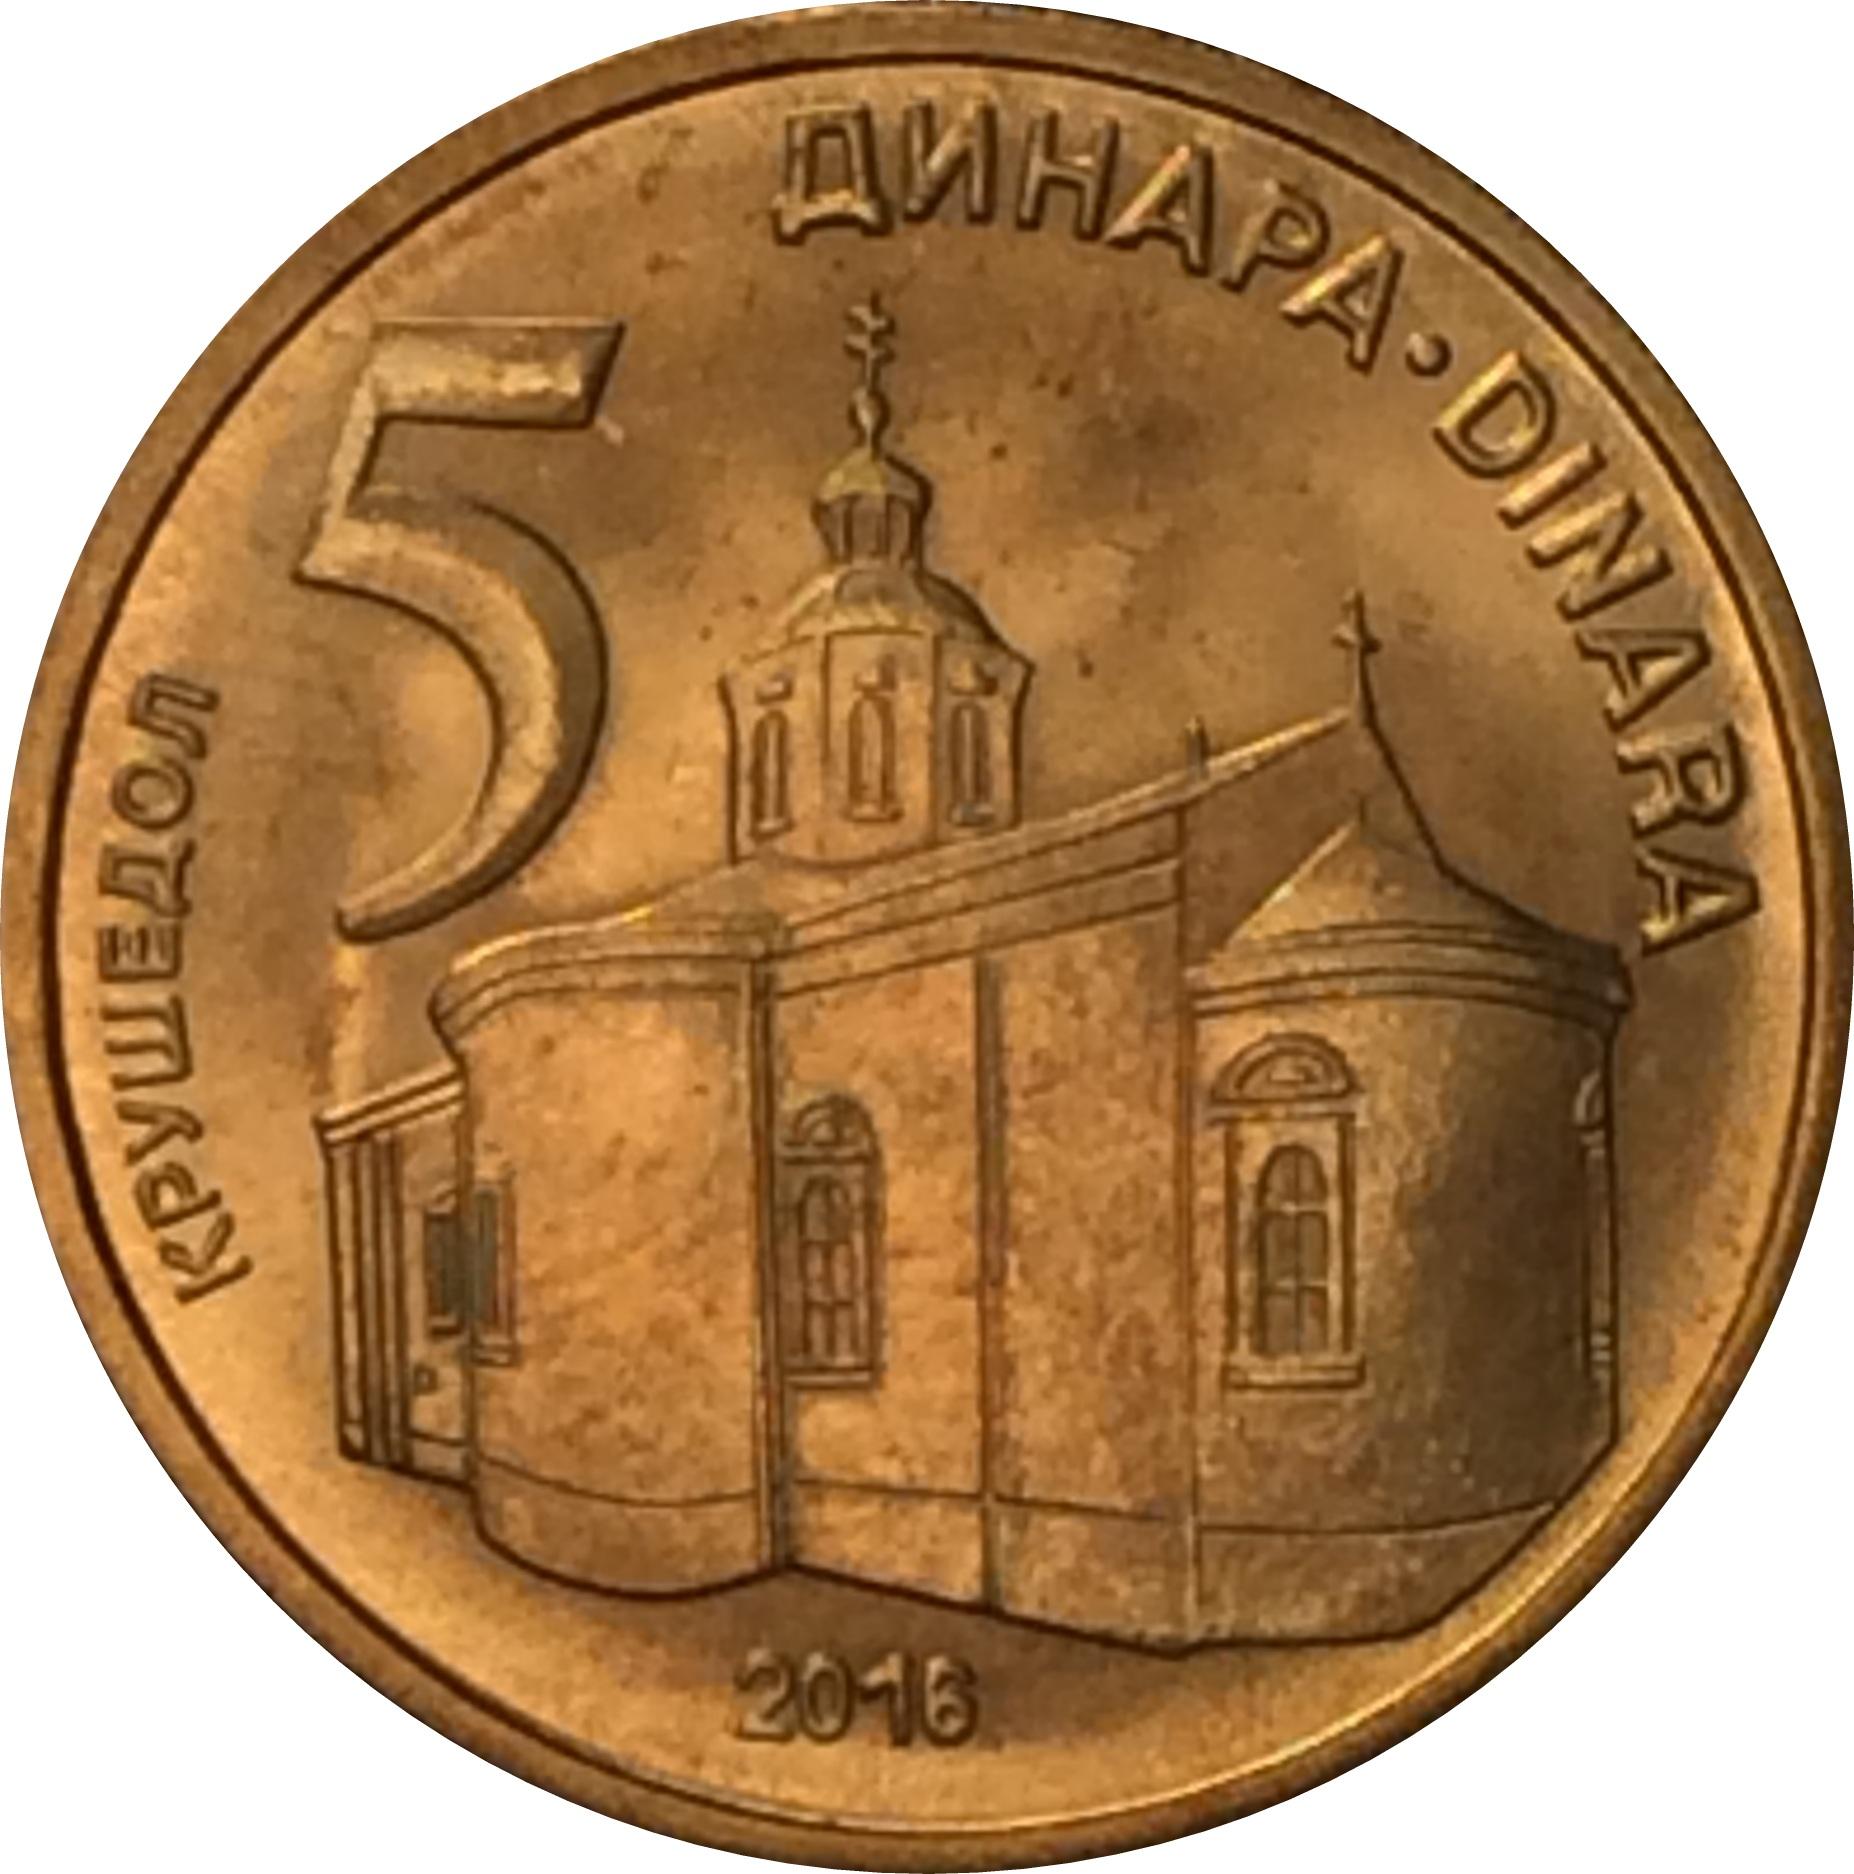 SERBIA SET 3 COINS 1 2 5 DINARA 2014 2016 UNC